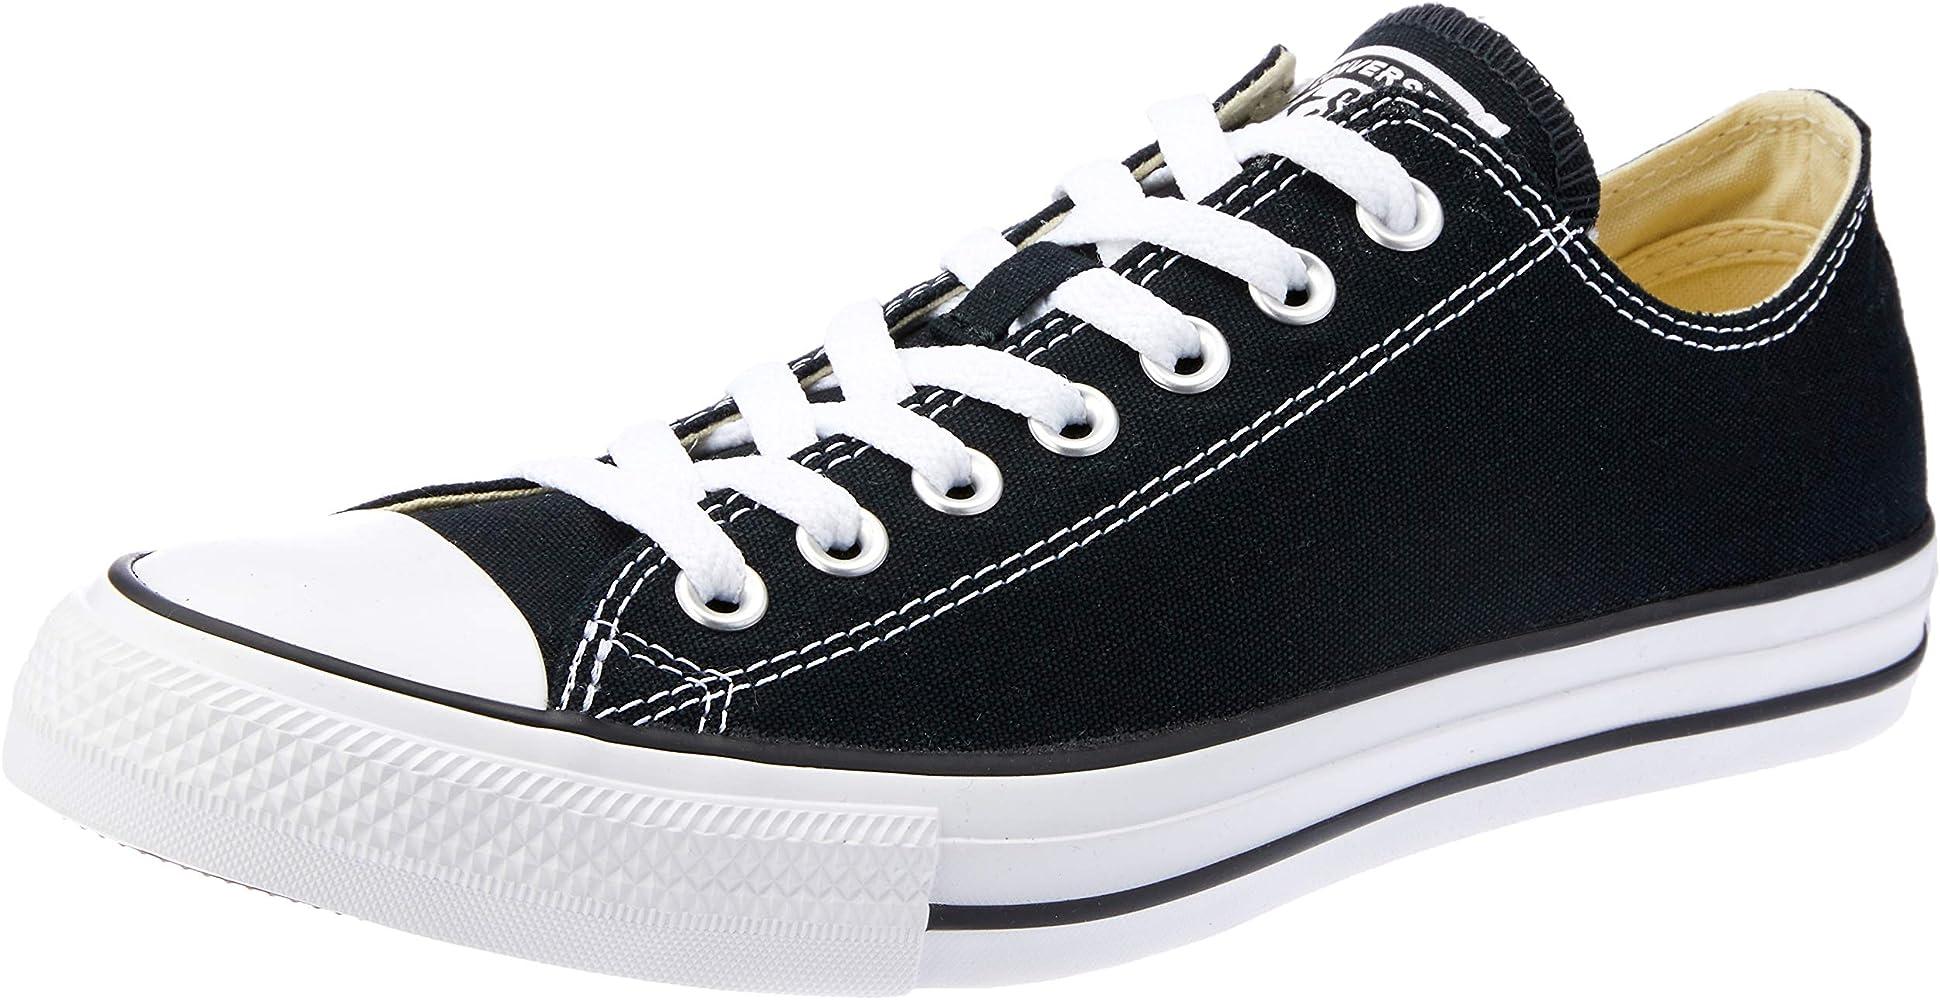 ec0b90cd292 Chuck Taylor All Star Low Top Sneakers